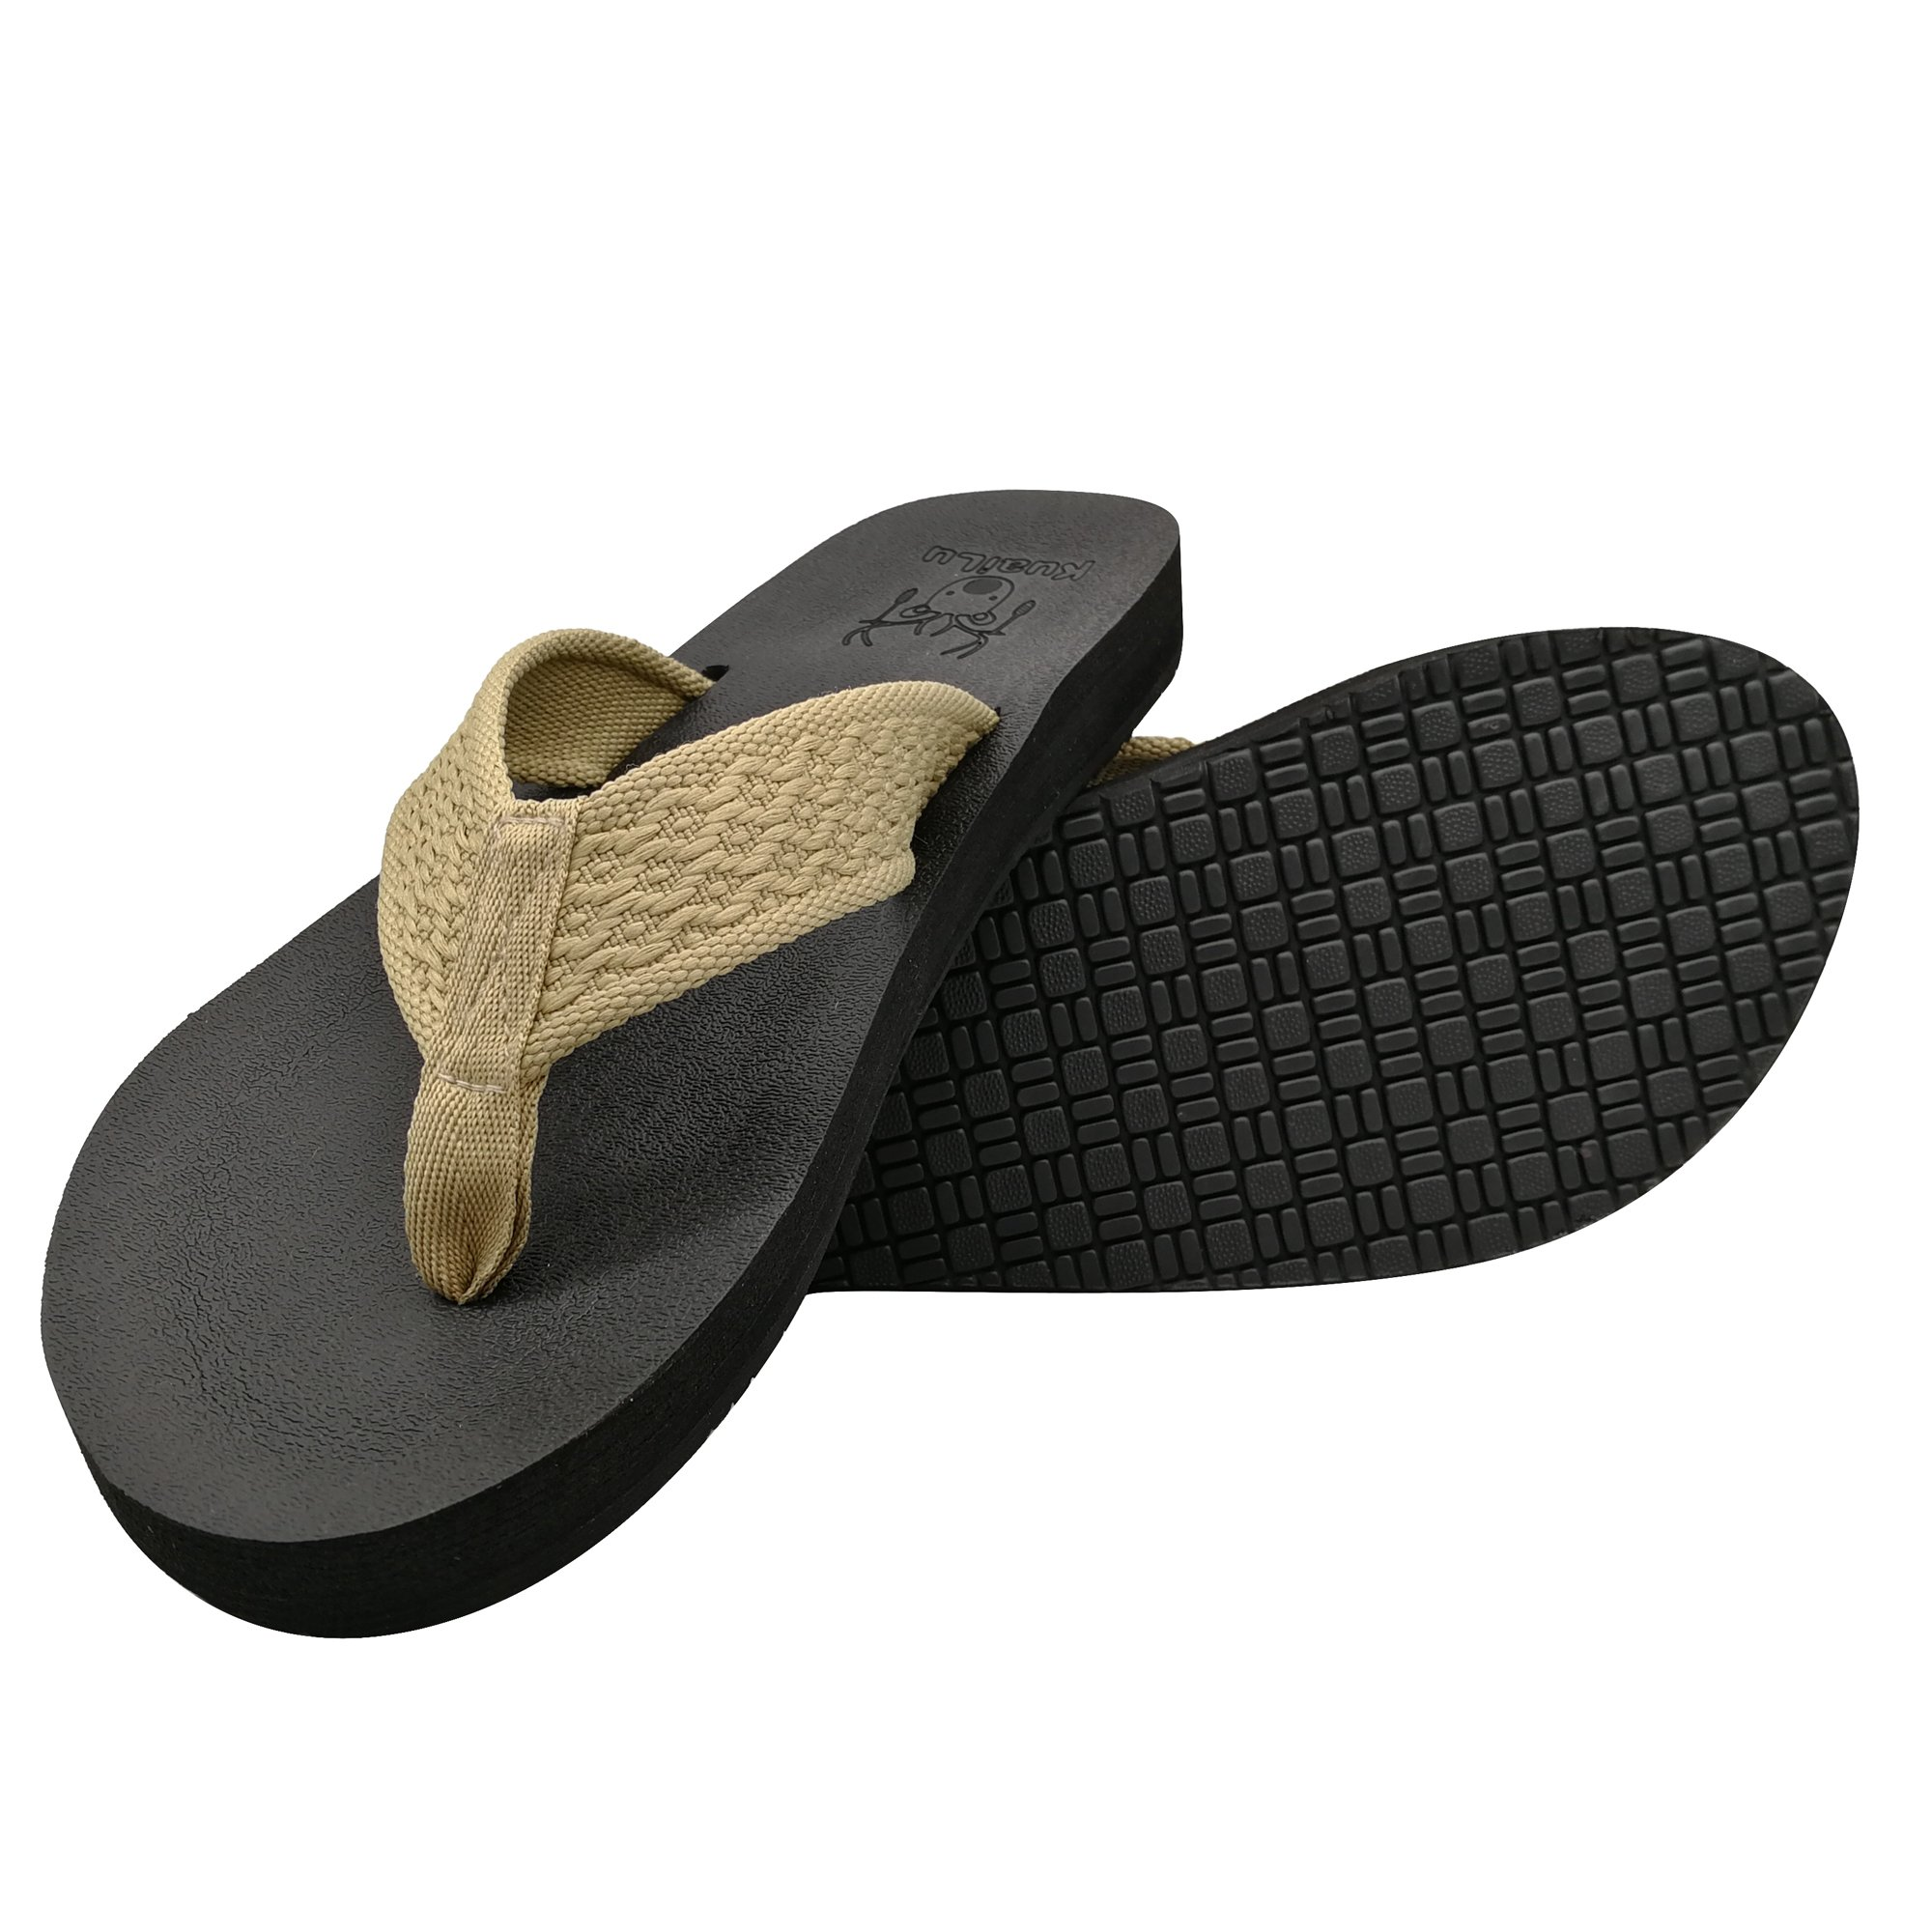 KuaiLu Men's Yoga Mat Flip Flop Nylon Strap Cushioned Foam Thong Sandals Anti Slip